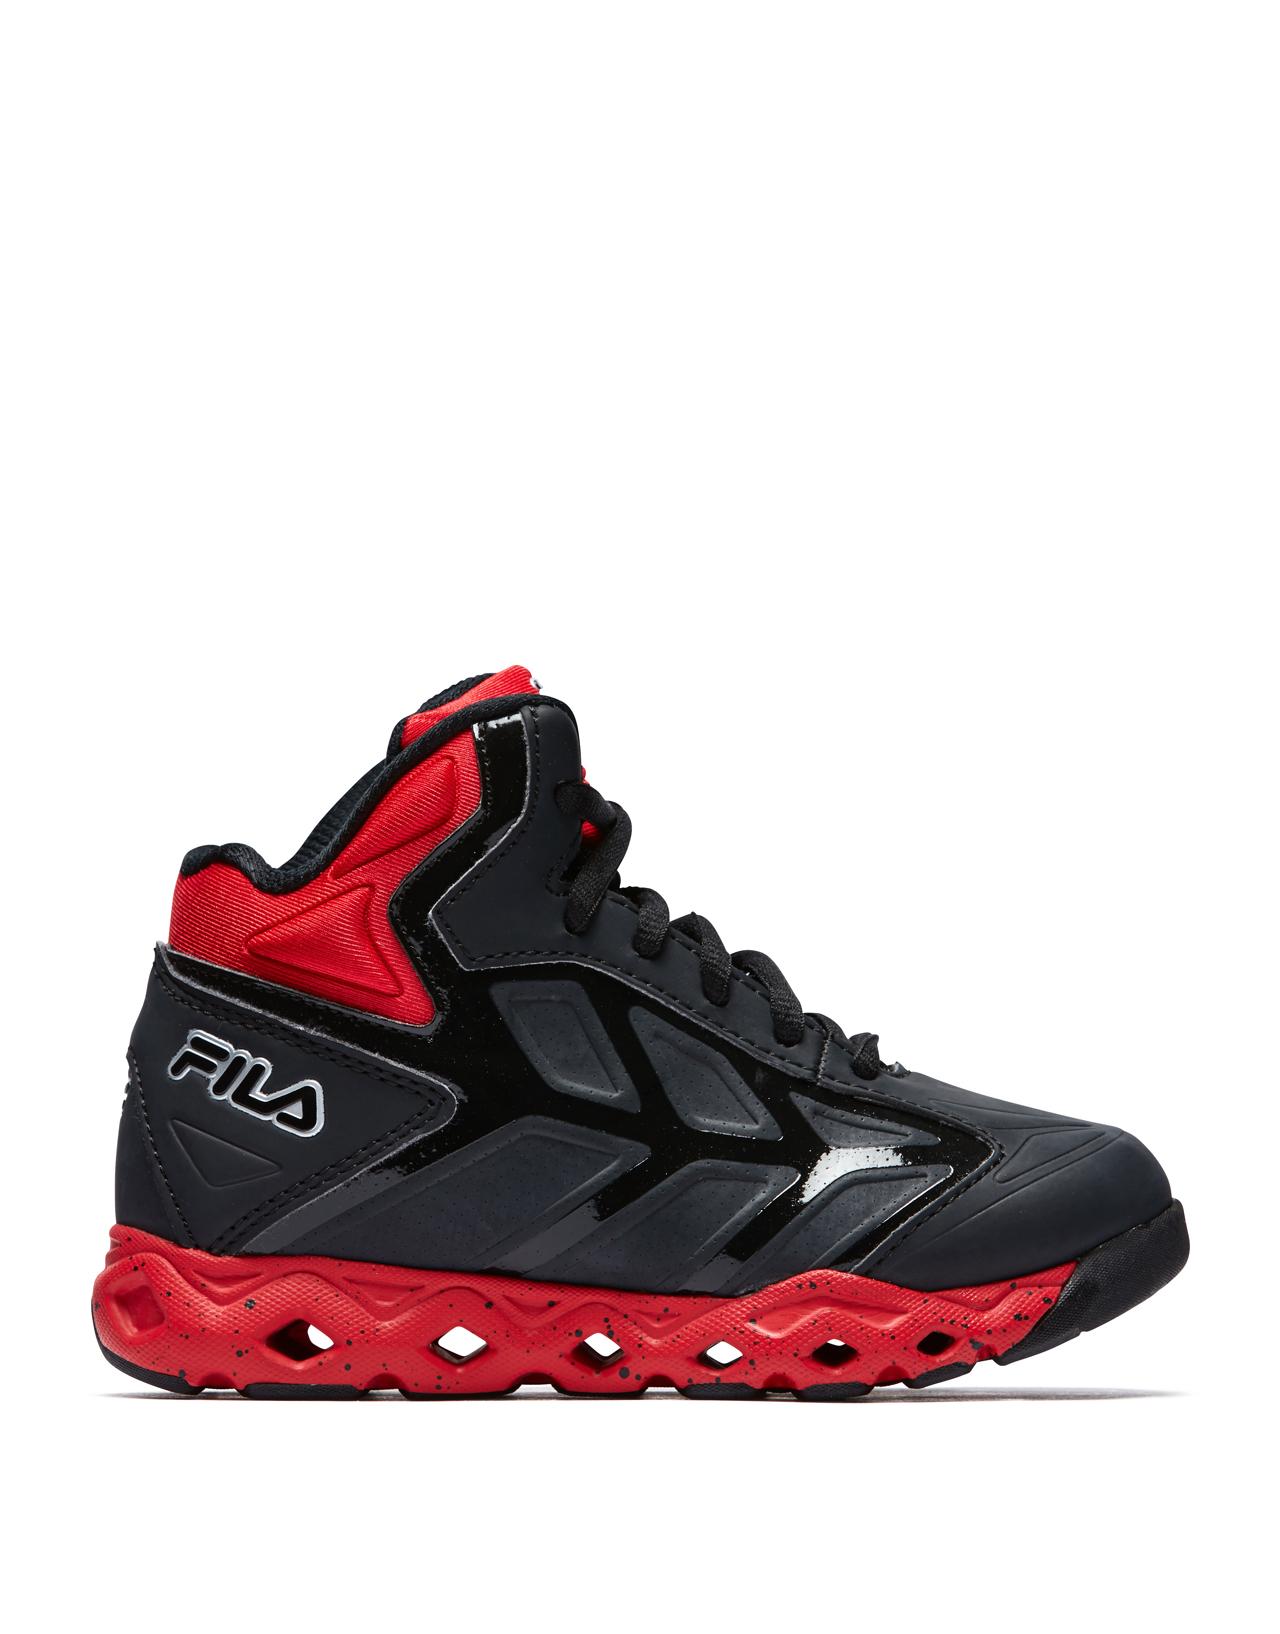 Basketball Shoes Ebay Ca